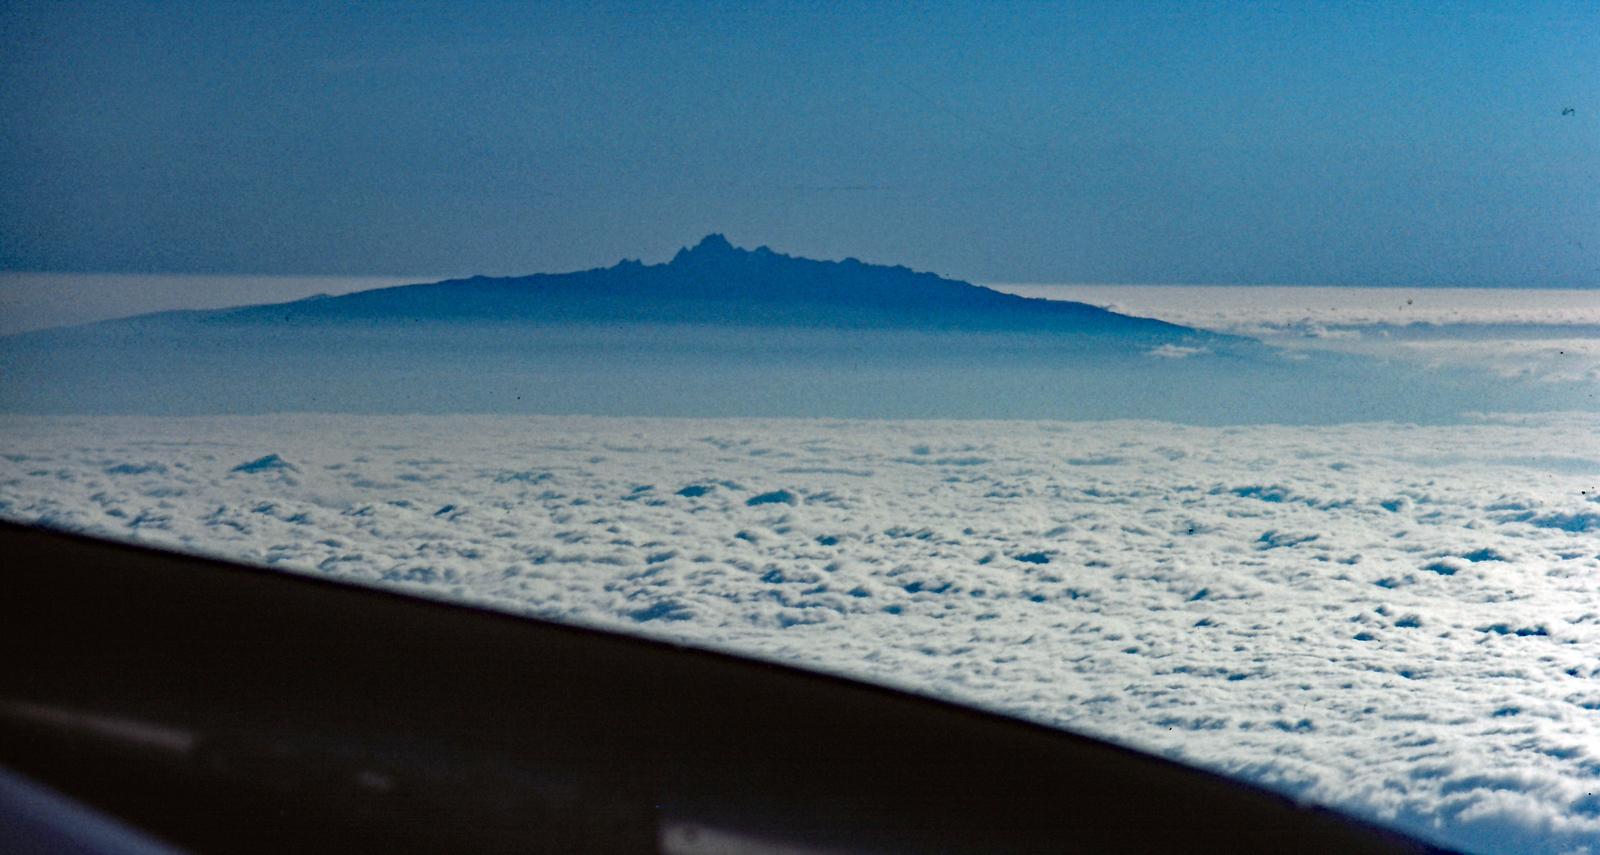 Mt Kenya from the air as we fly into Nairobi